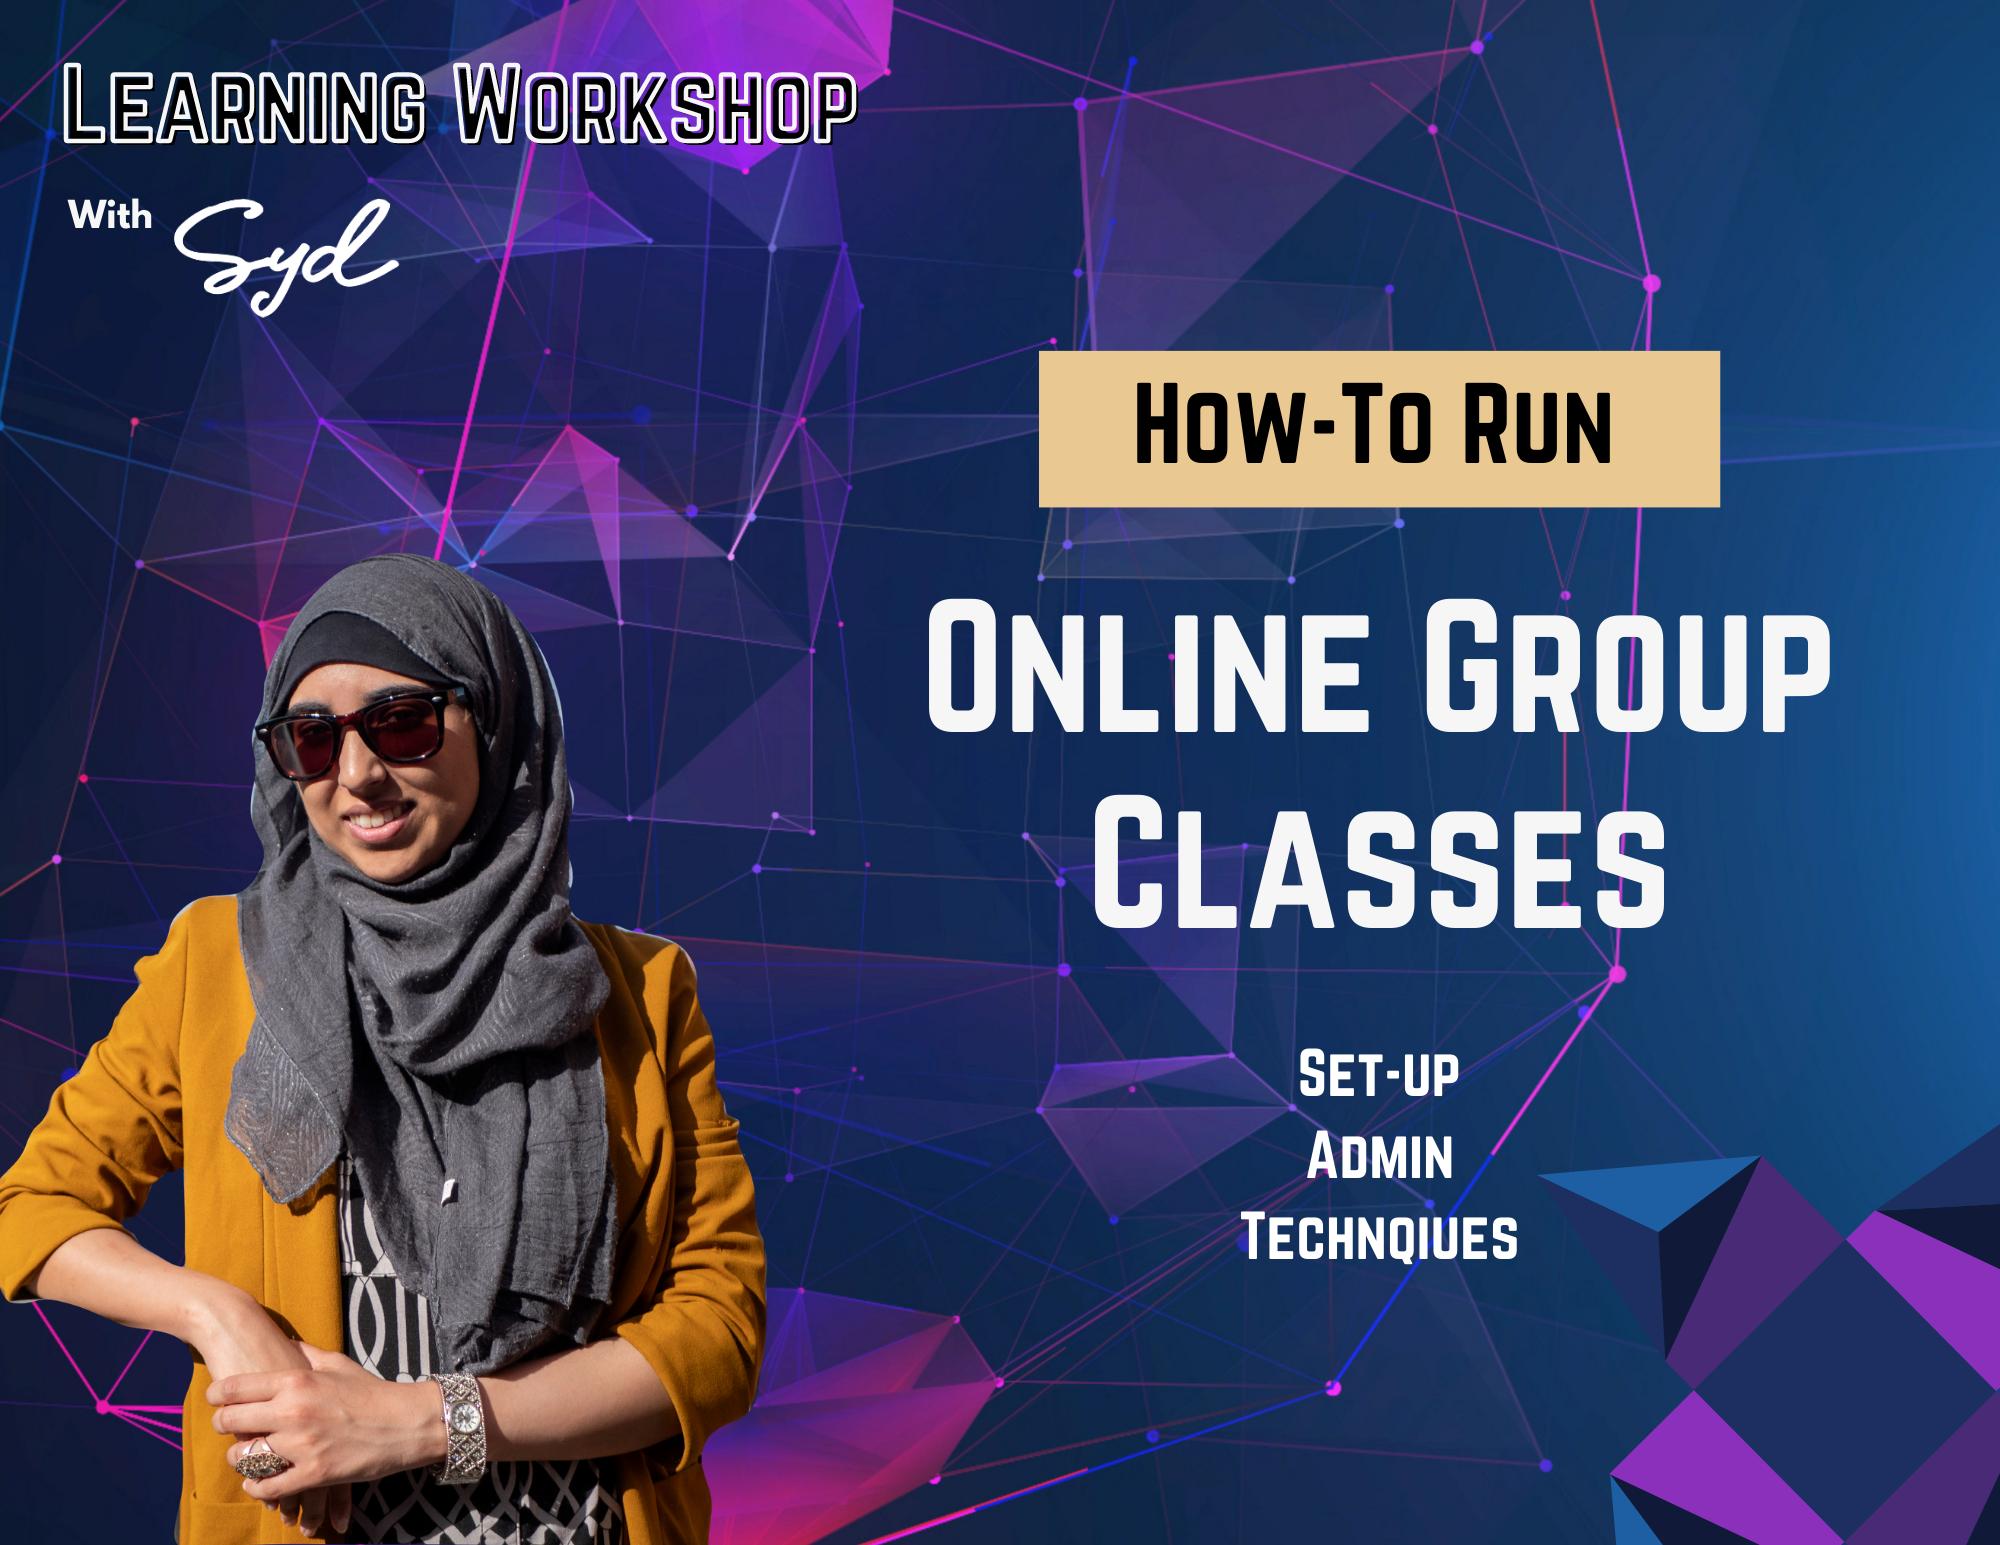 Online Group Classes Workshop